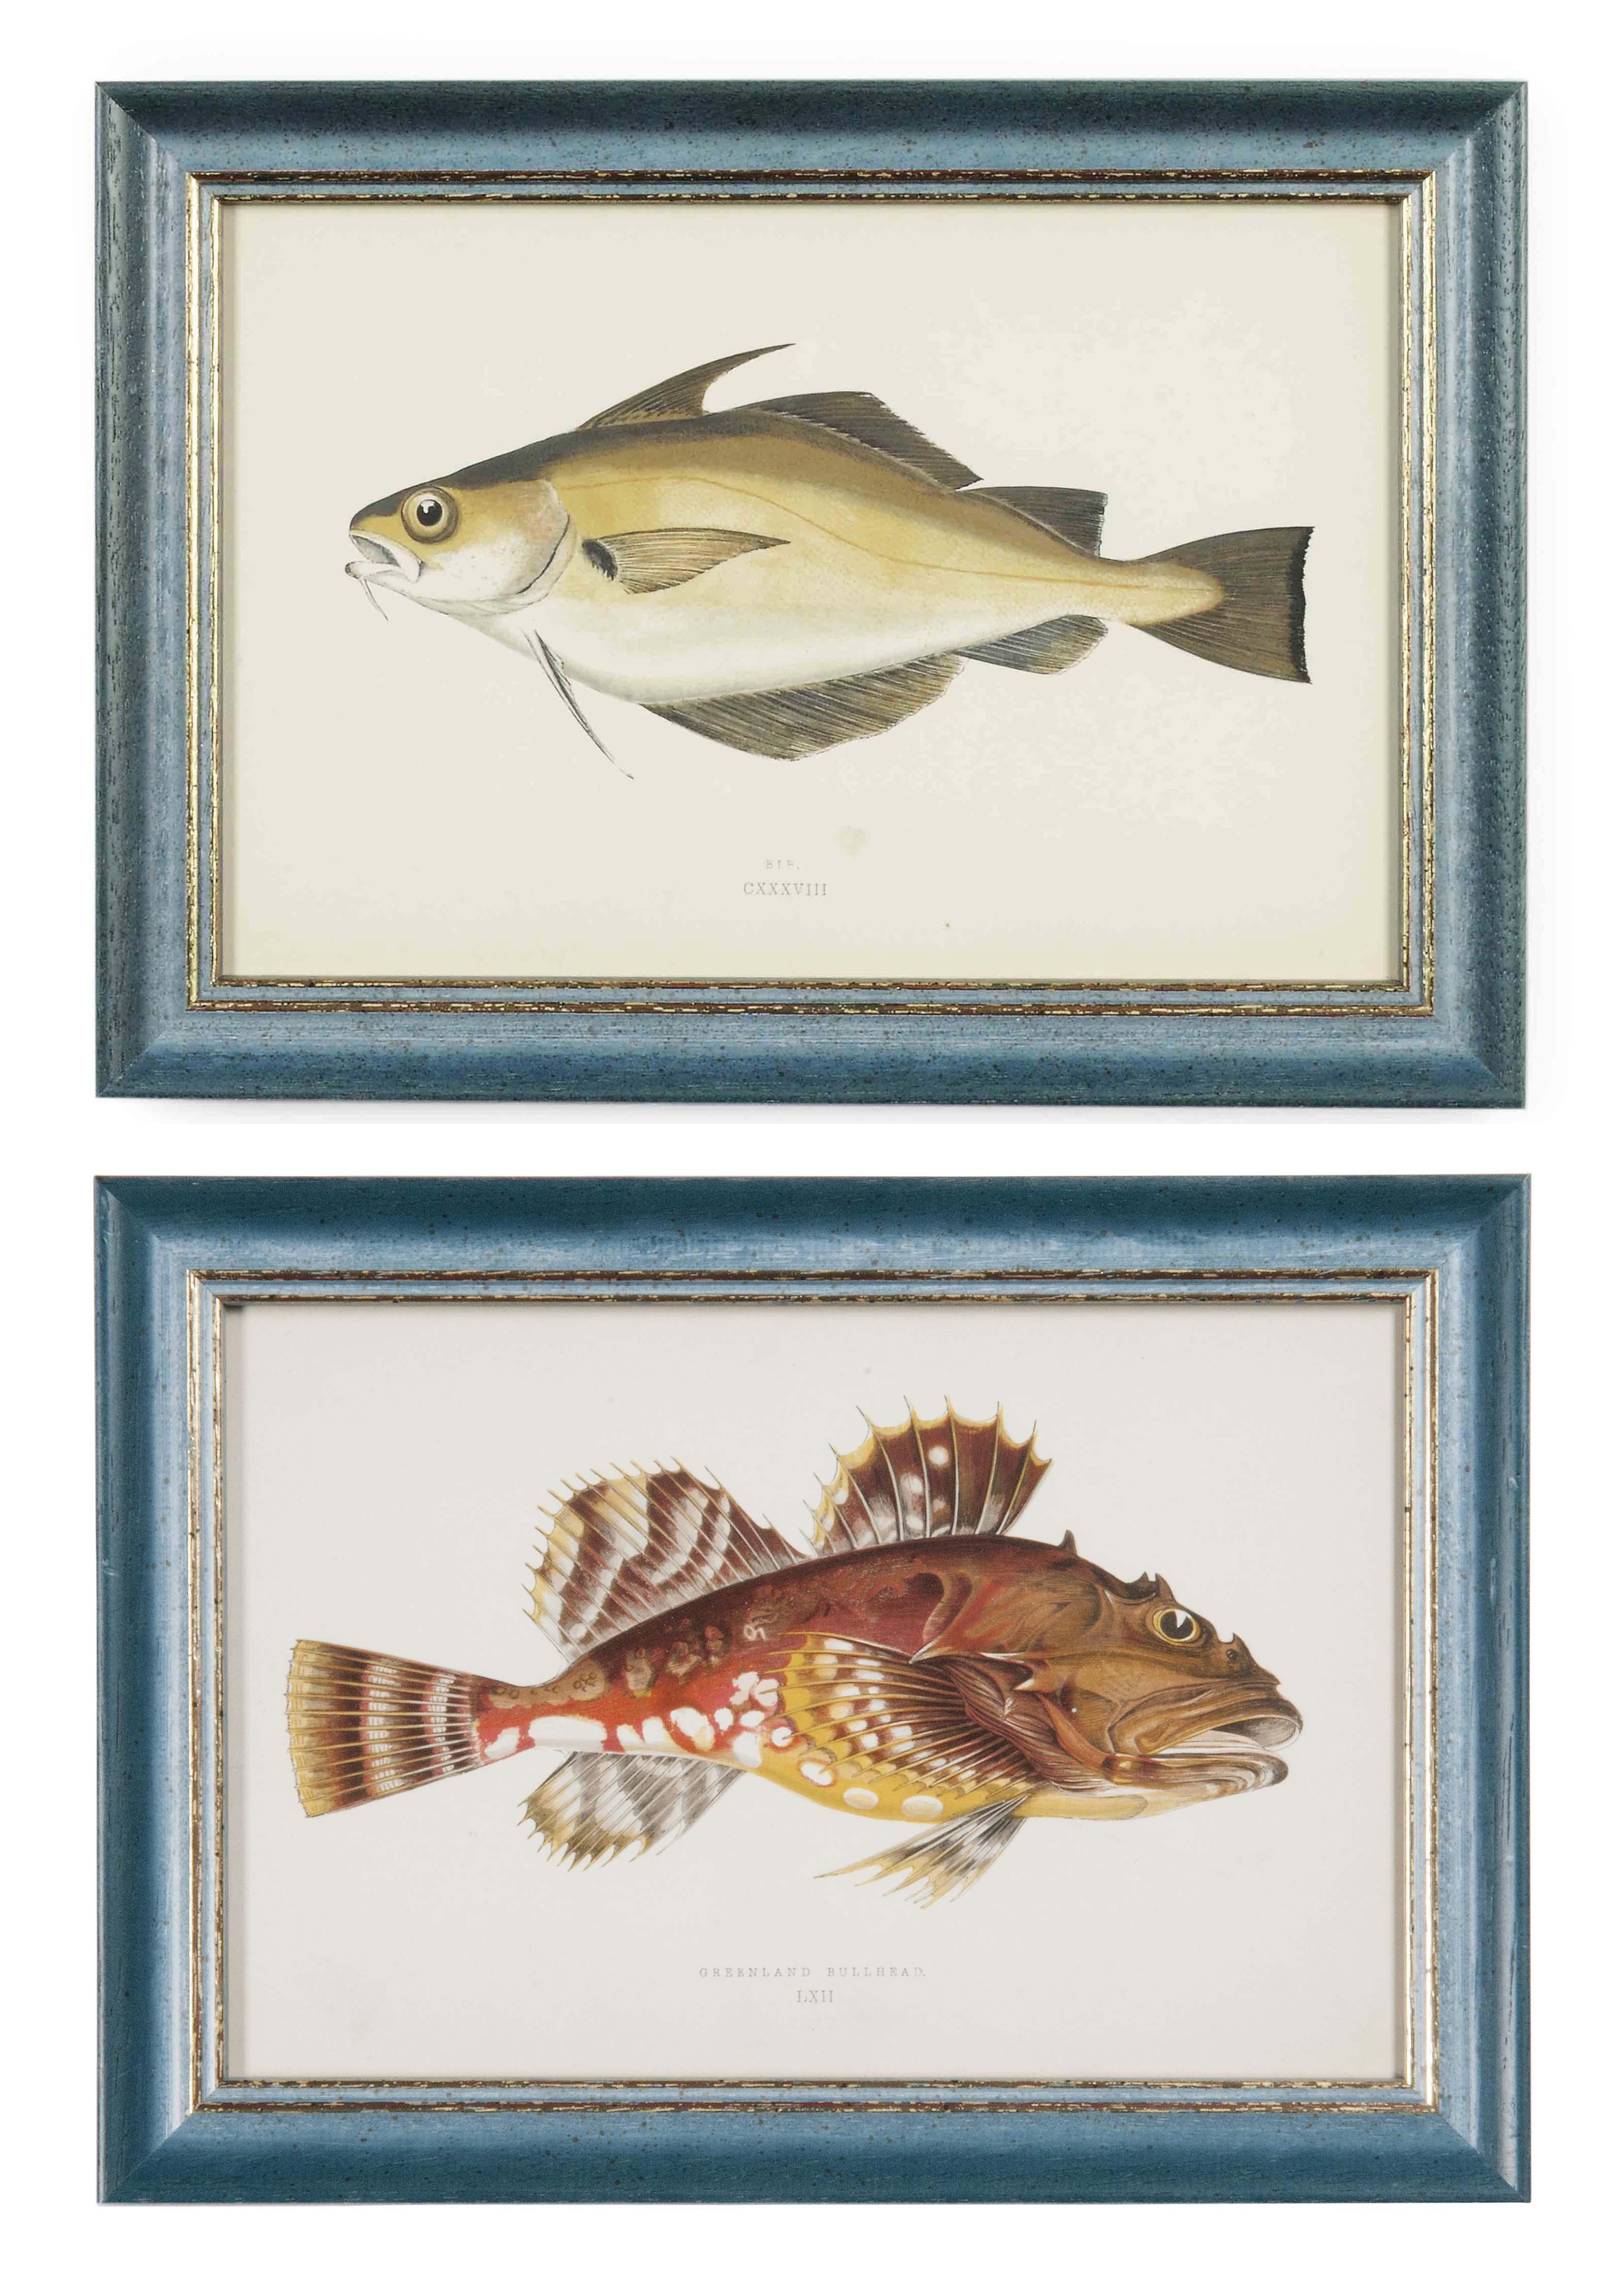 TWENTY FOUR ENGRAVINGS OF FISH